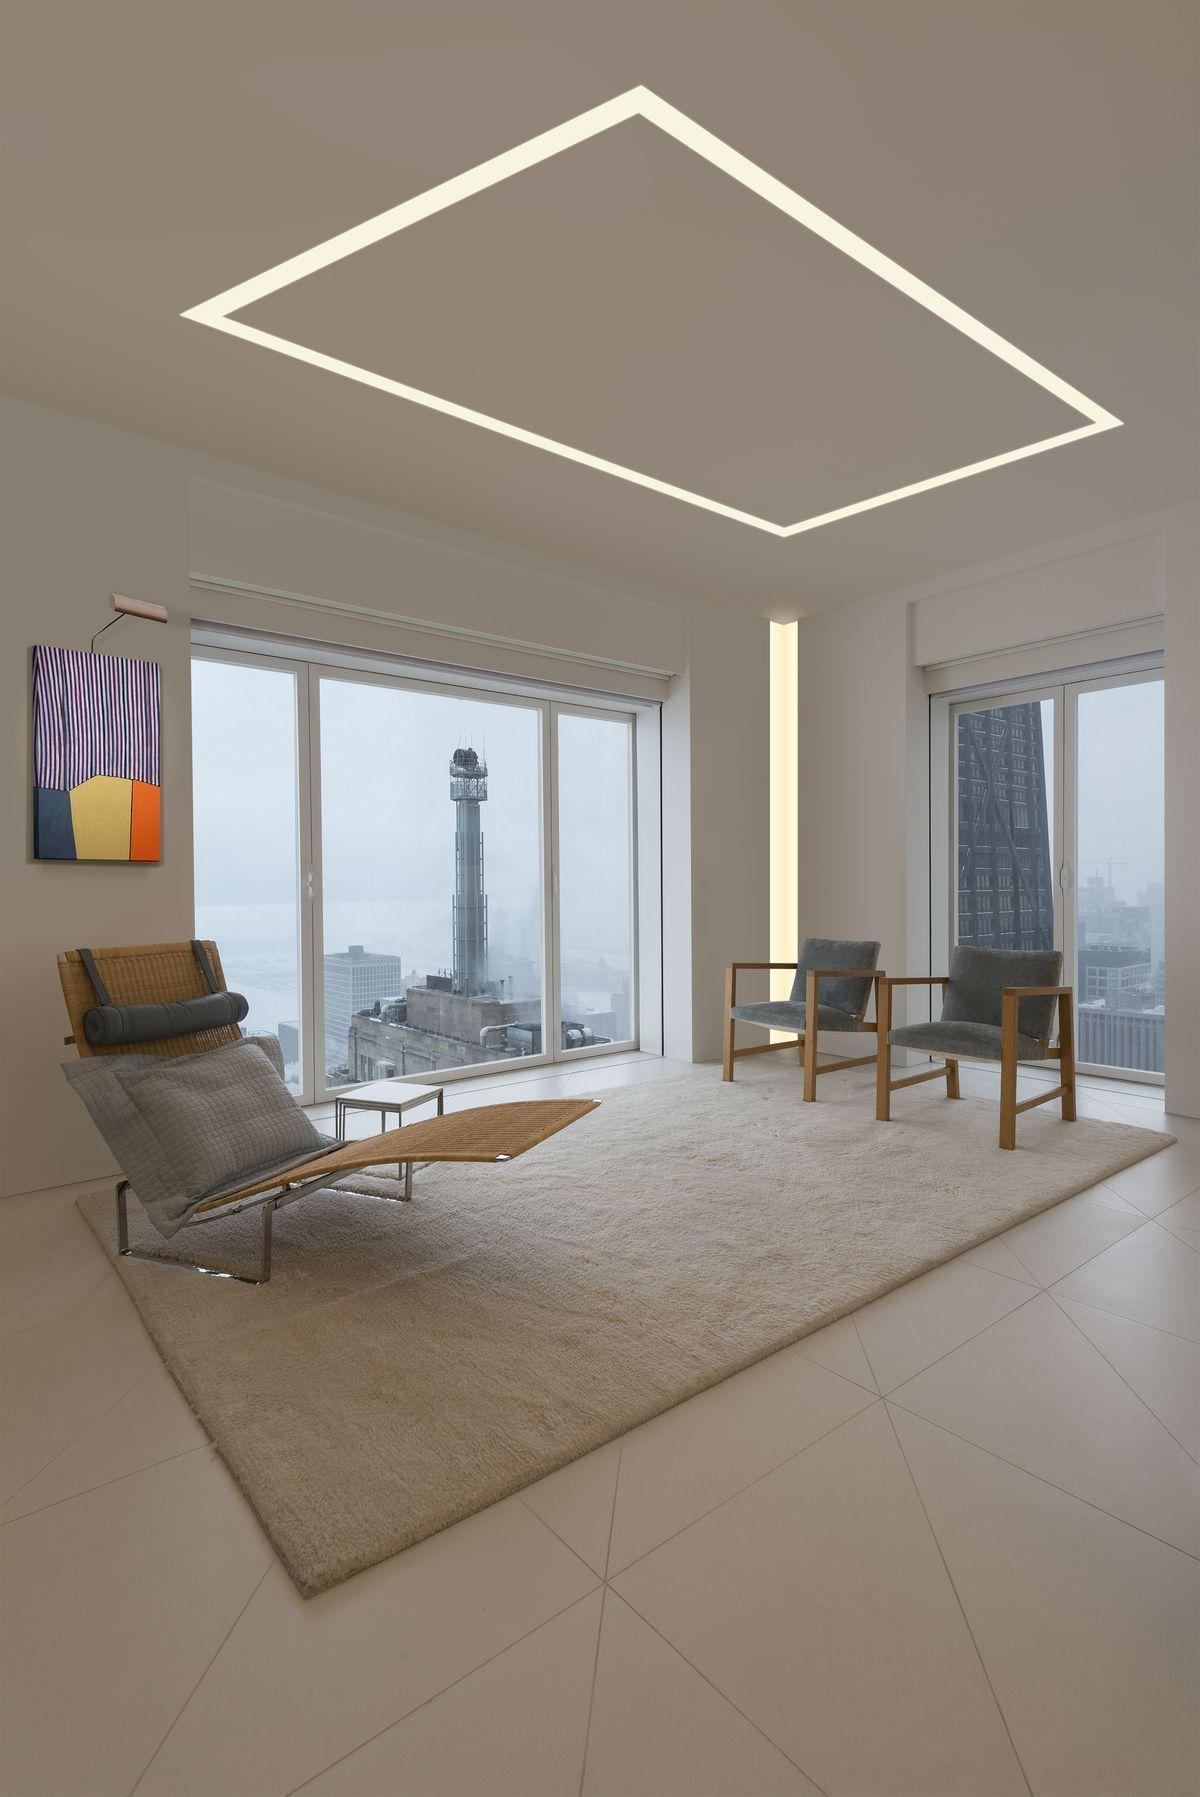 home interior design led plaster in lighting solutions interiors